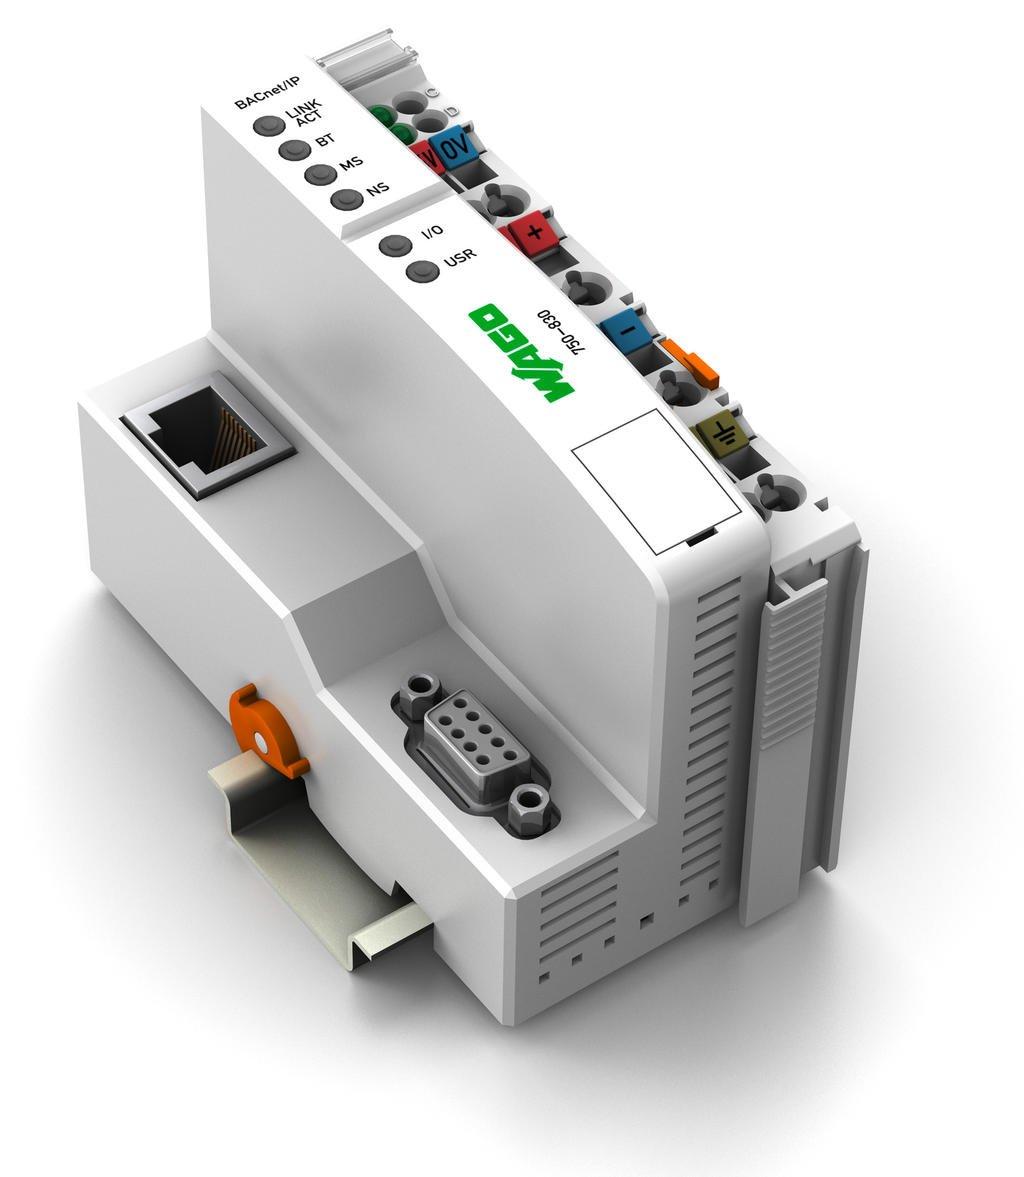 Wago-i/o-system 750 programmable fieldbus controller ethernet /100.